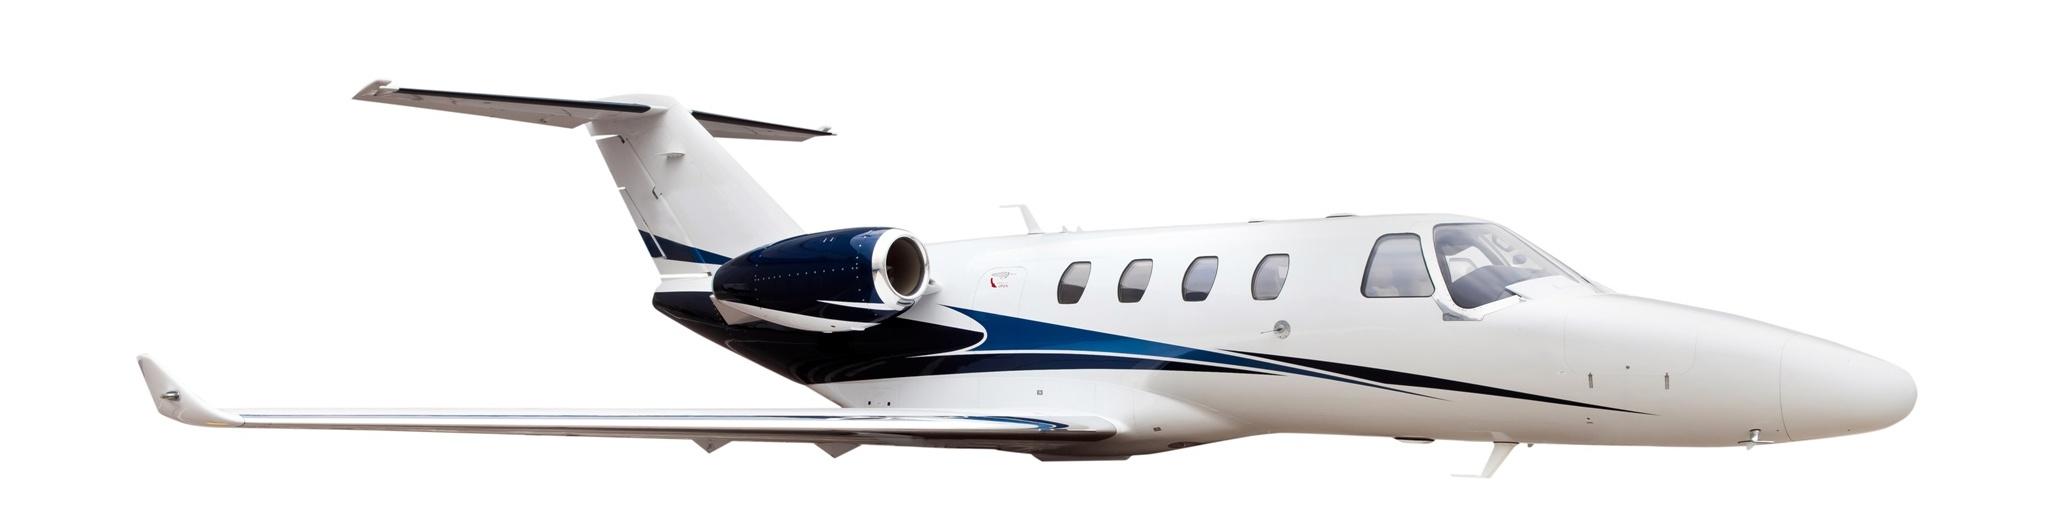 Заказ и аренда частного самолета